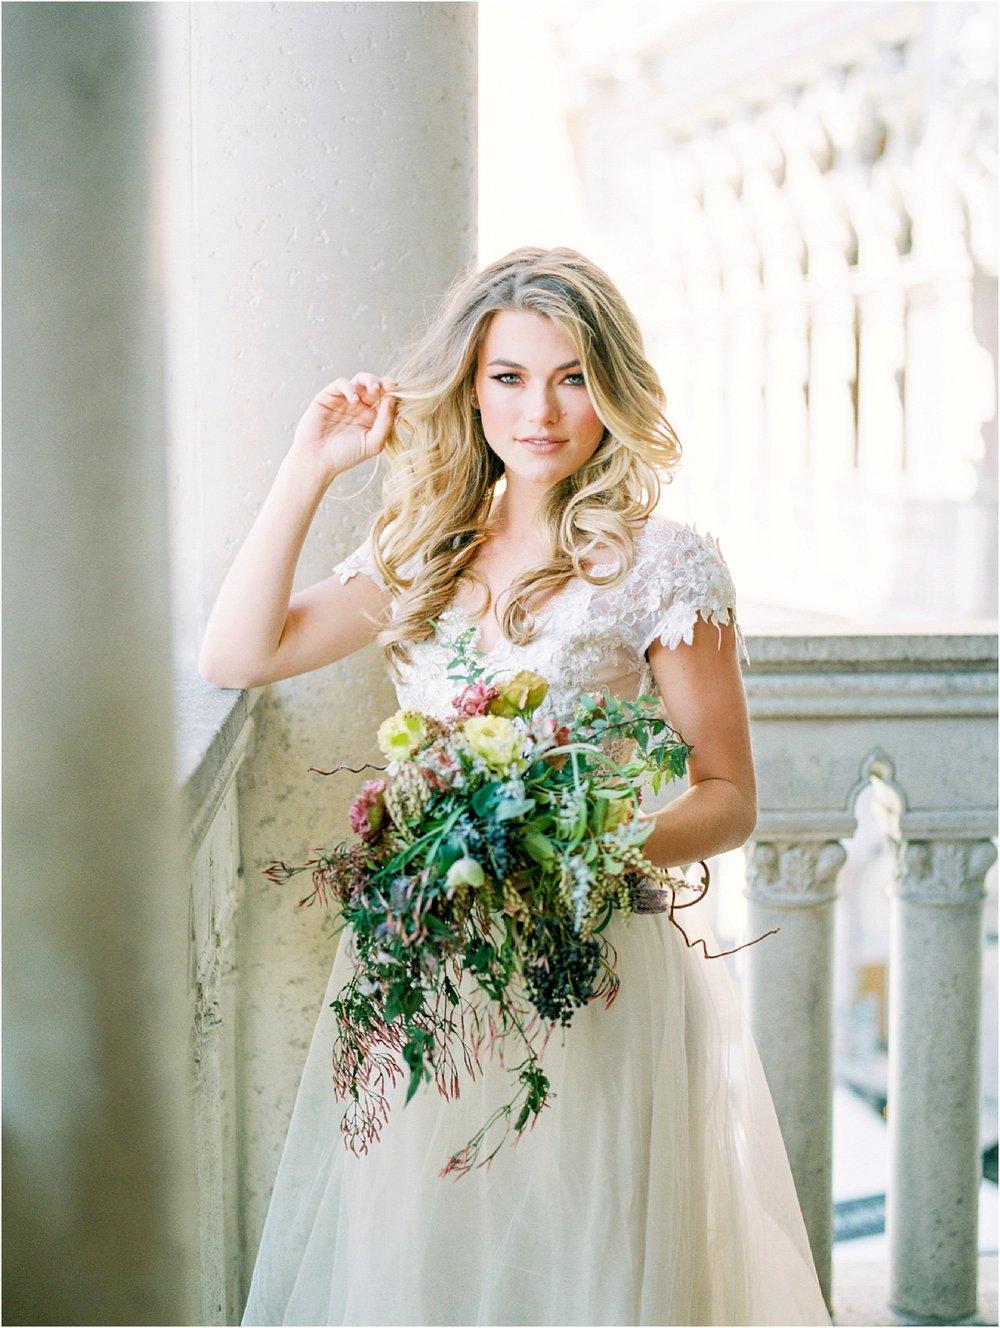 Lisa Silva Photography- Ponte Vedra Beach, St. Augustine and Jacksonville, Florida Fine Art Film Wedding and Boudoir Photography- Fine Art Film Bridal Editorial at the Venitian, Las Vegas_0020.jpg